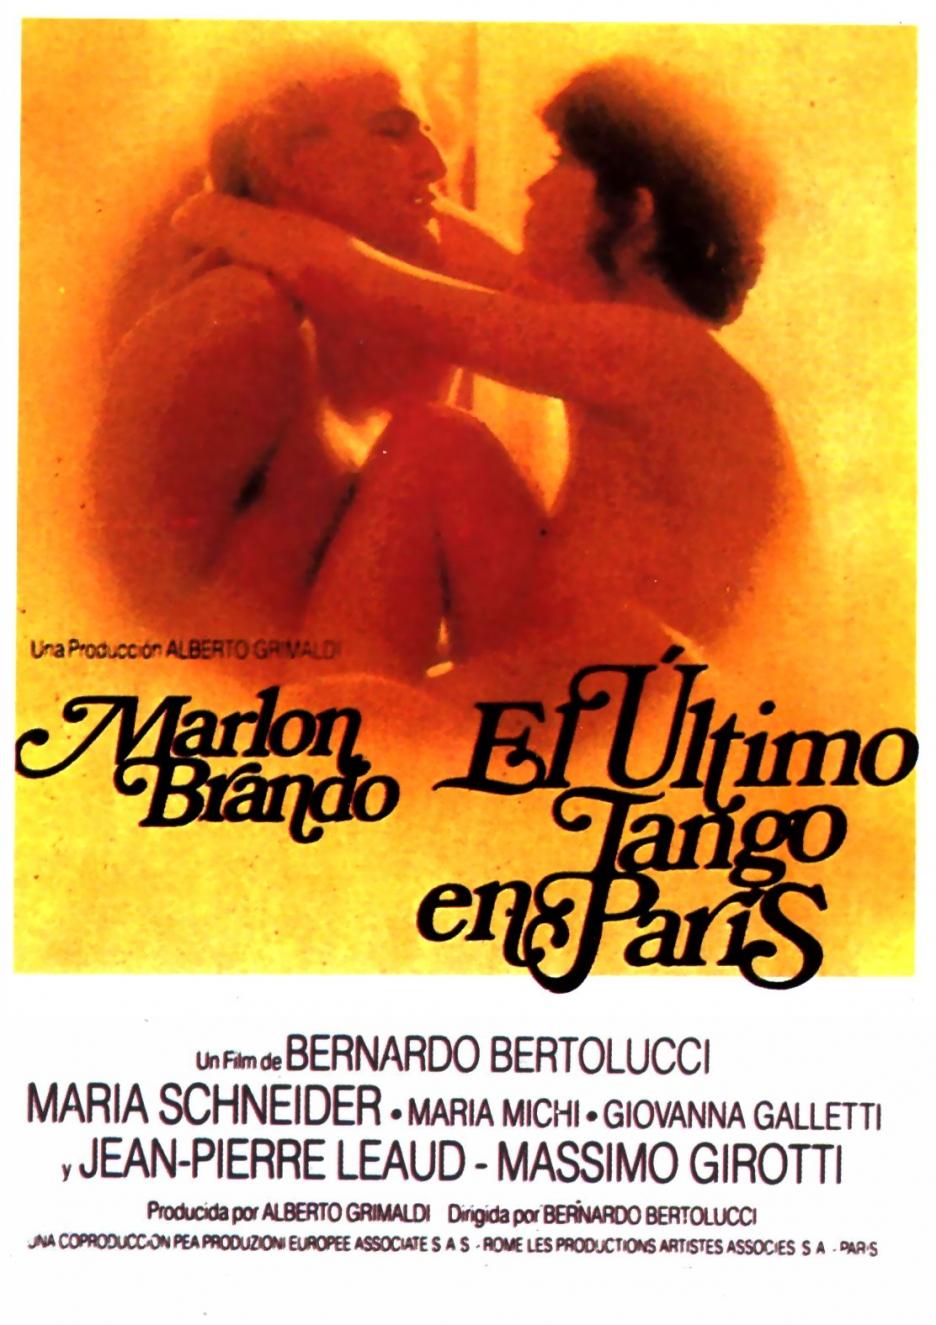 Marlond Brando 936full-last-tango-in-paris-poster